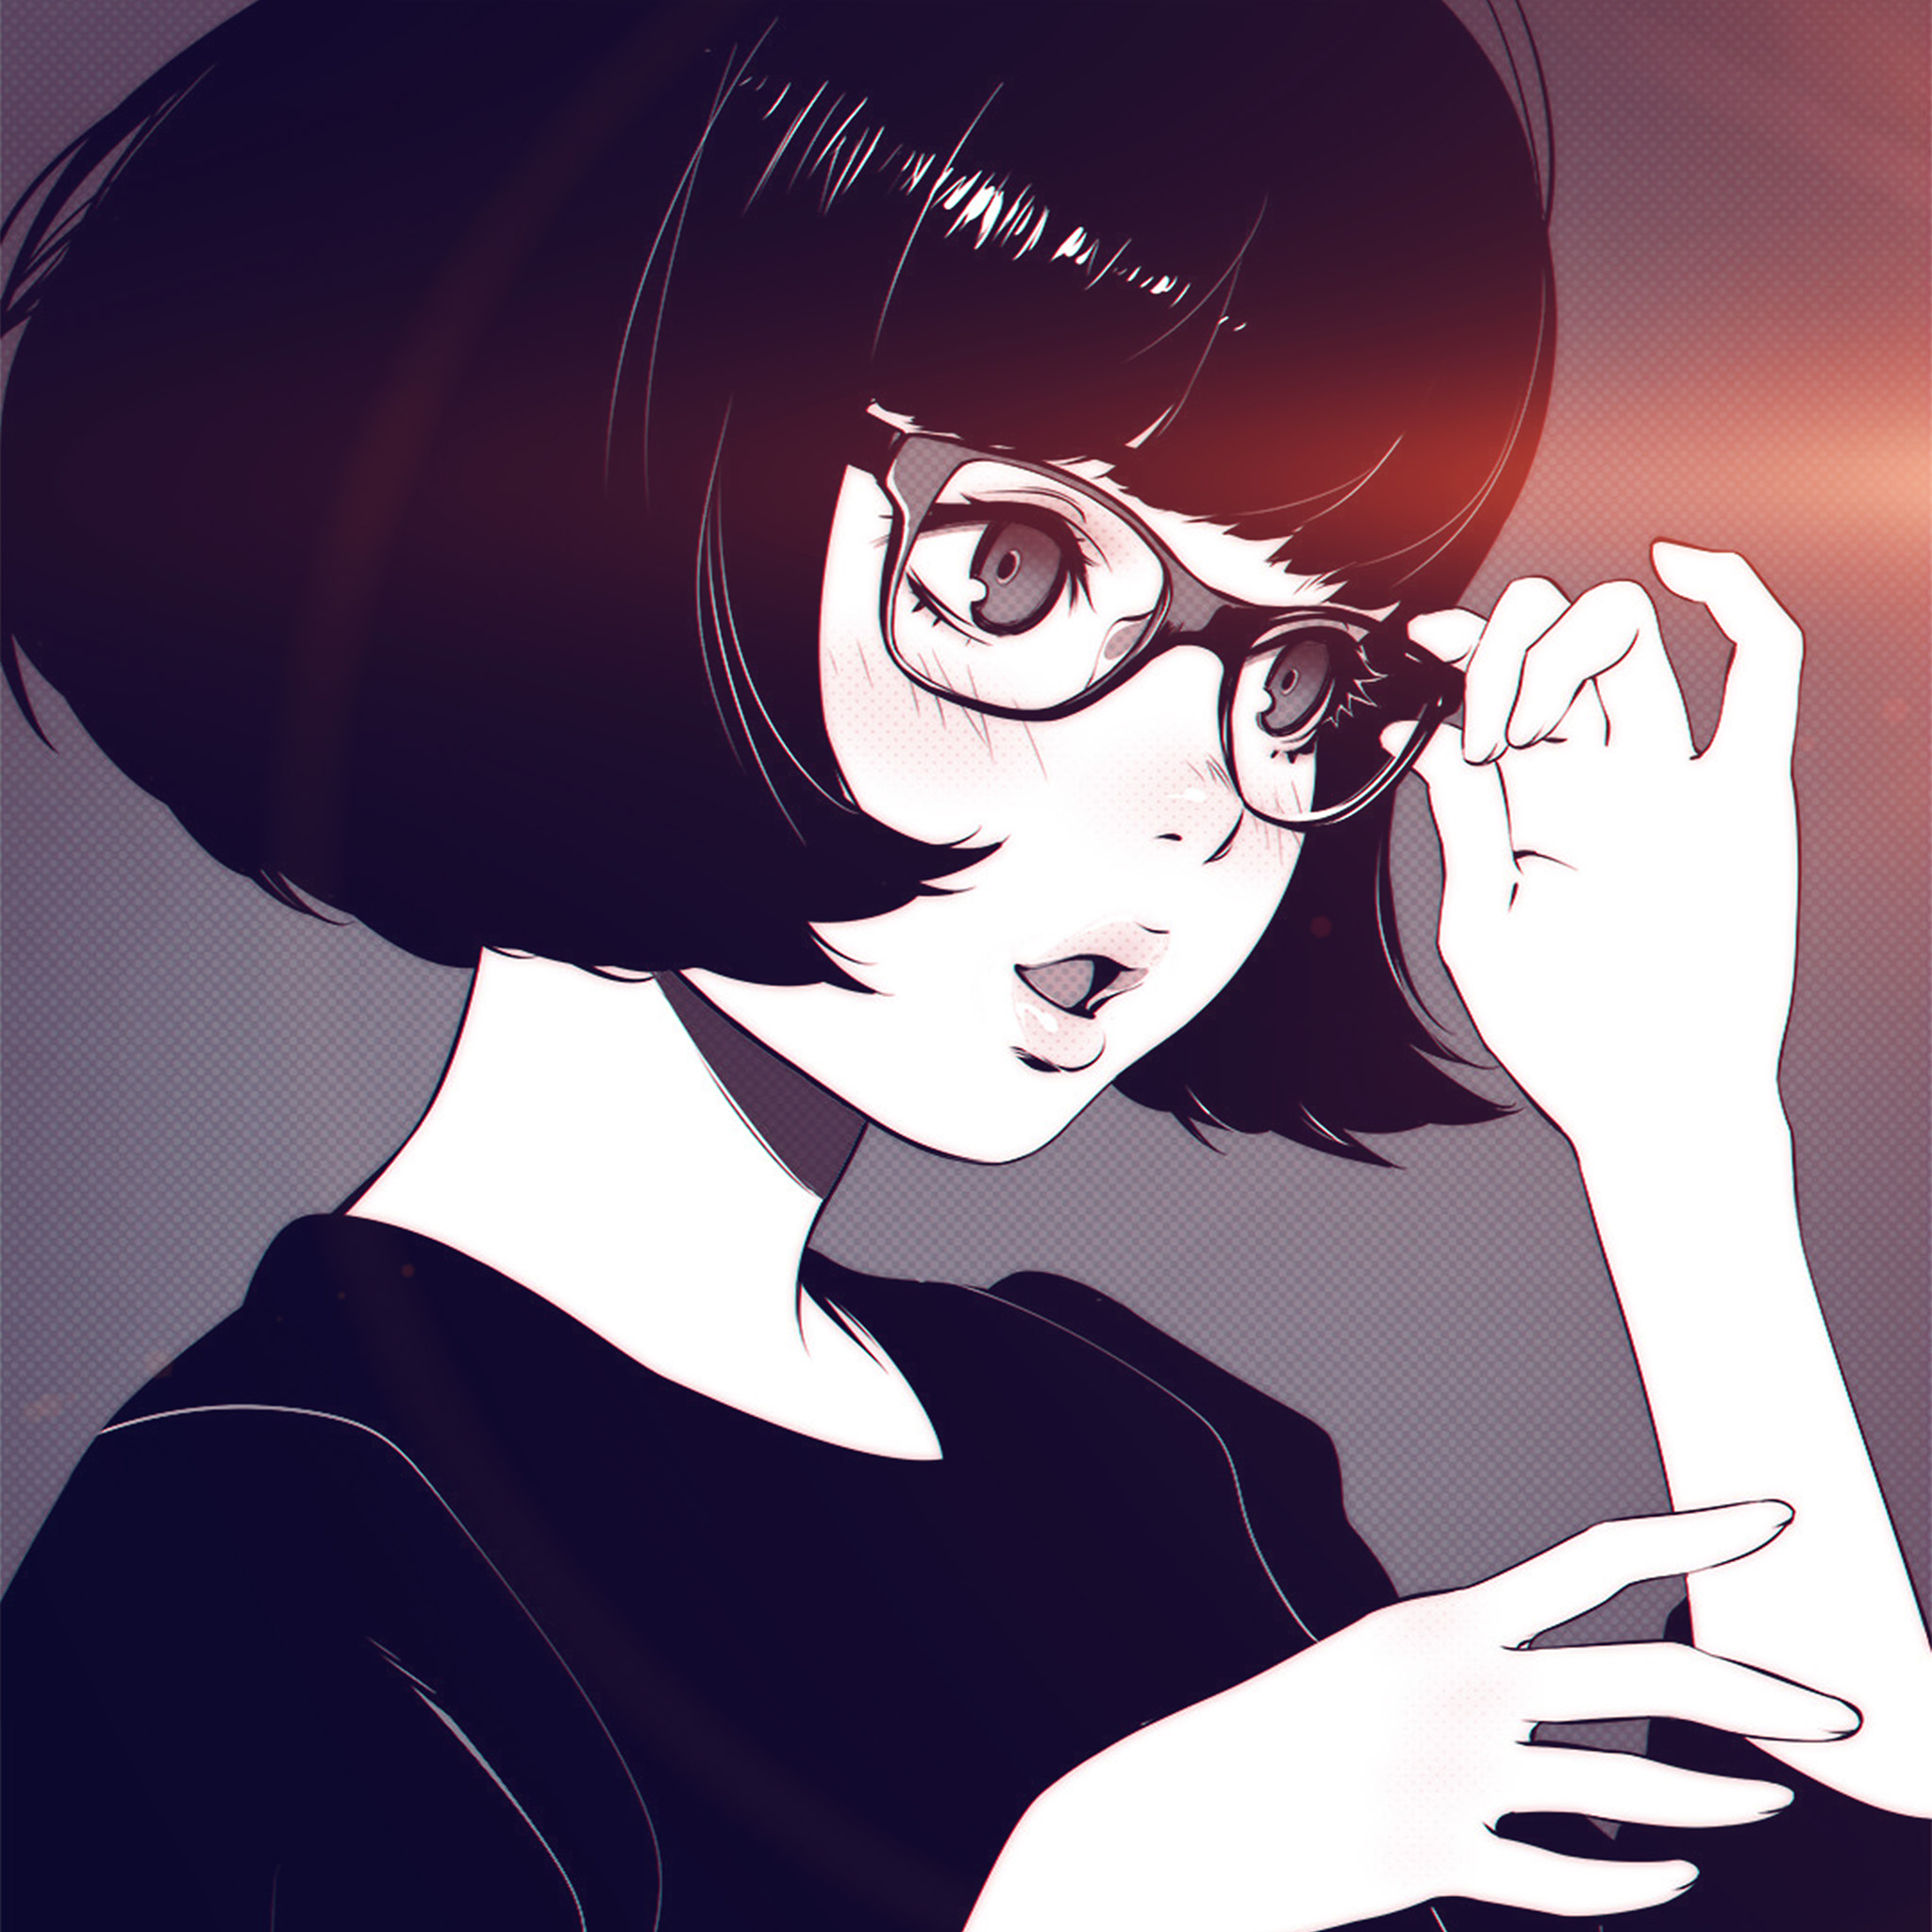 Cute Emo Wallpapers For Iphone Aw23 Girl Bw Anime Ilya Kuvshinov Illustration Art Flare